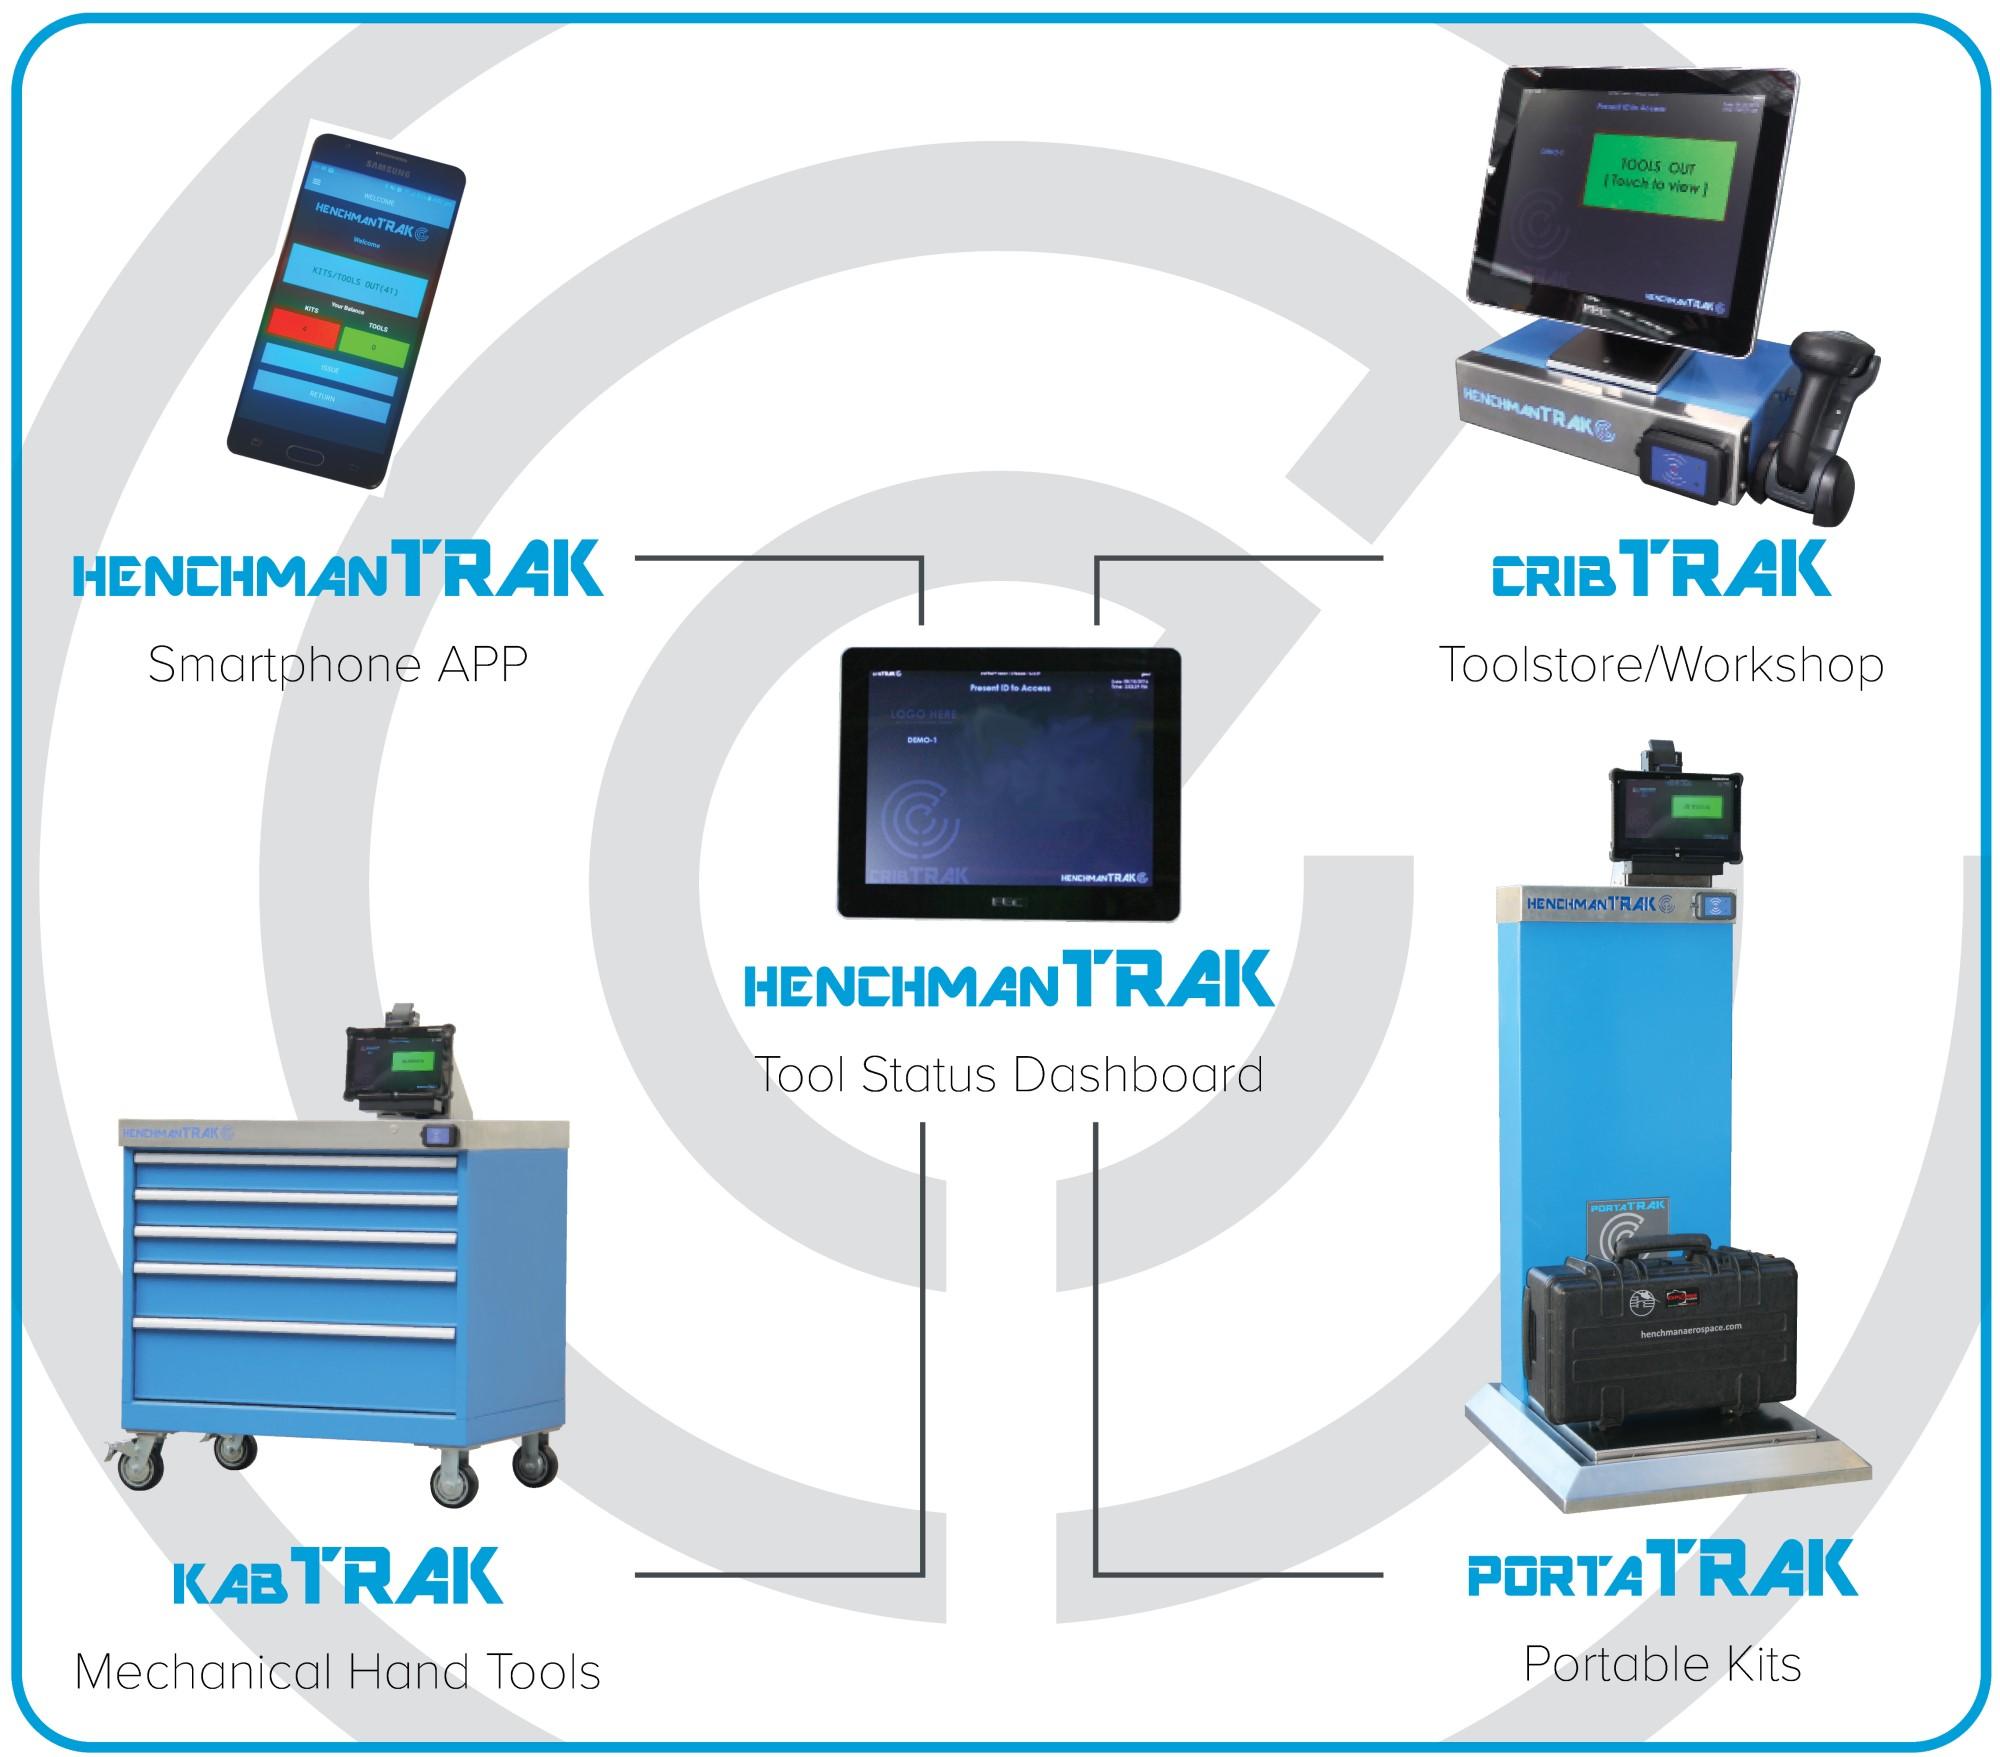 HenchmanTRAK Family - Electronic Tool Control